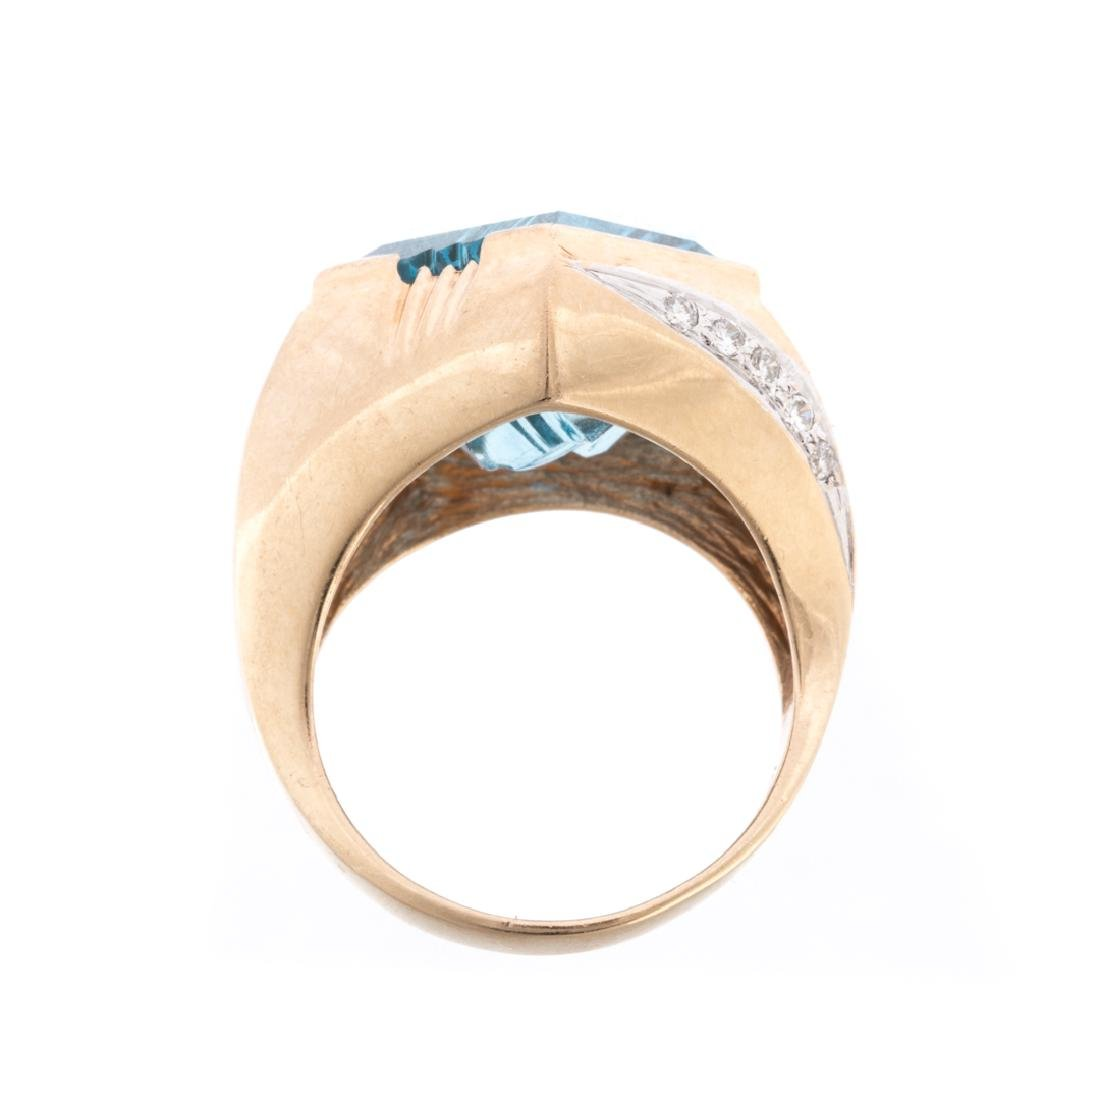 A Lady's Contemporary Blue Topaz & Diamond Ring - 3